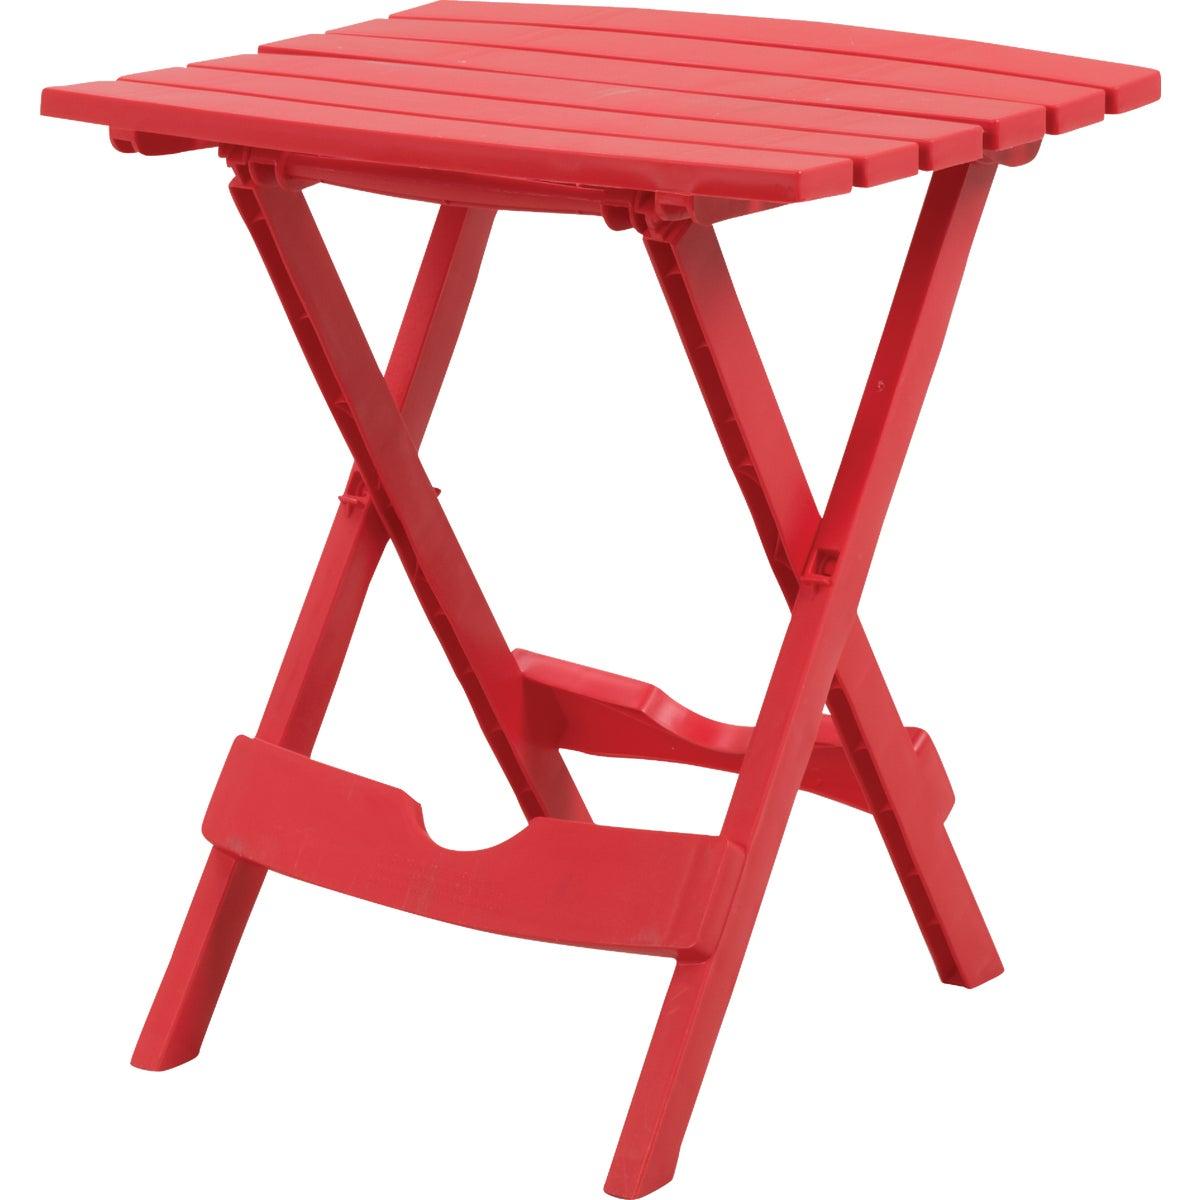 CHERRY QUIK FOLD TABLE